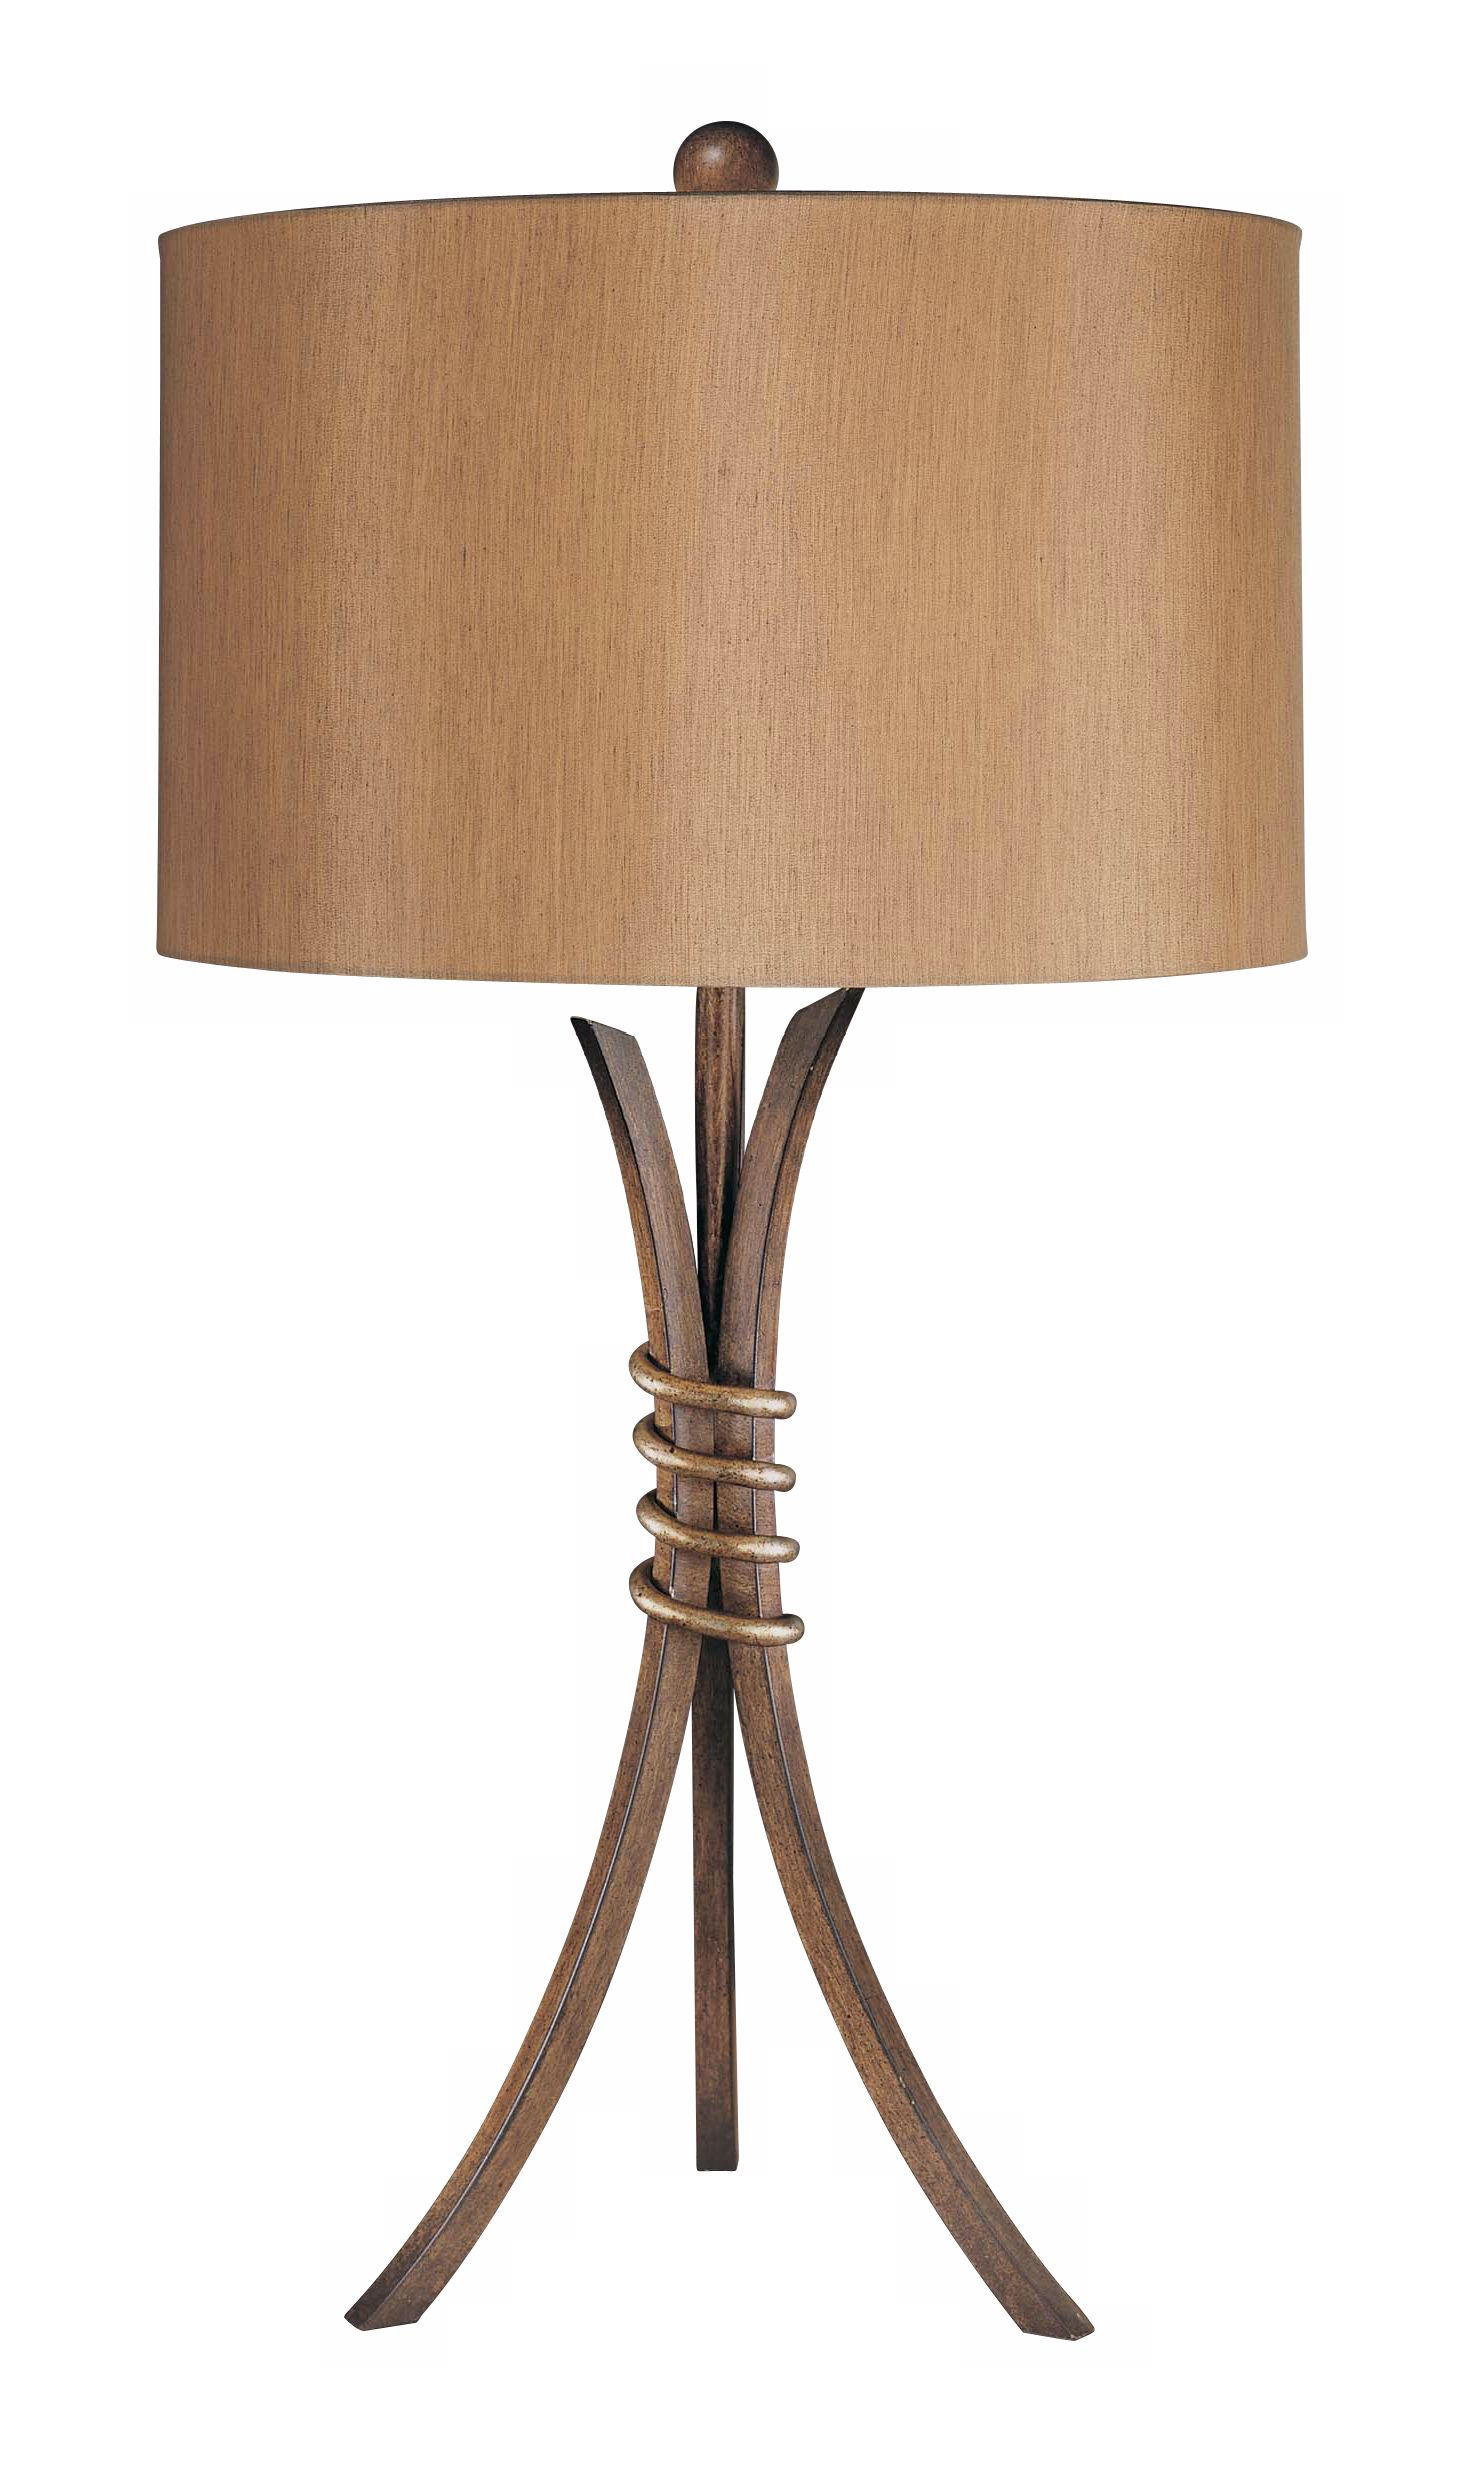 Delightful Ambience Iron Tripod Table Lamp